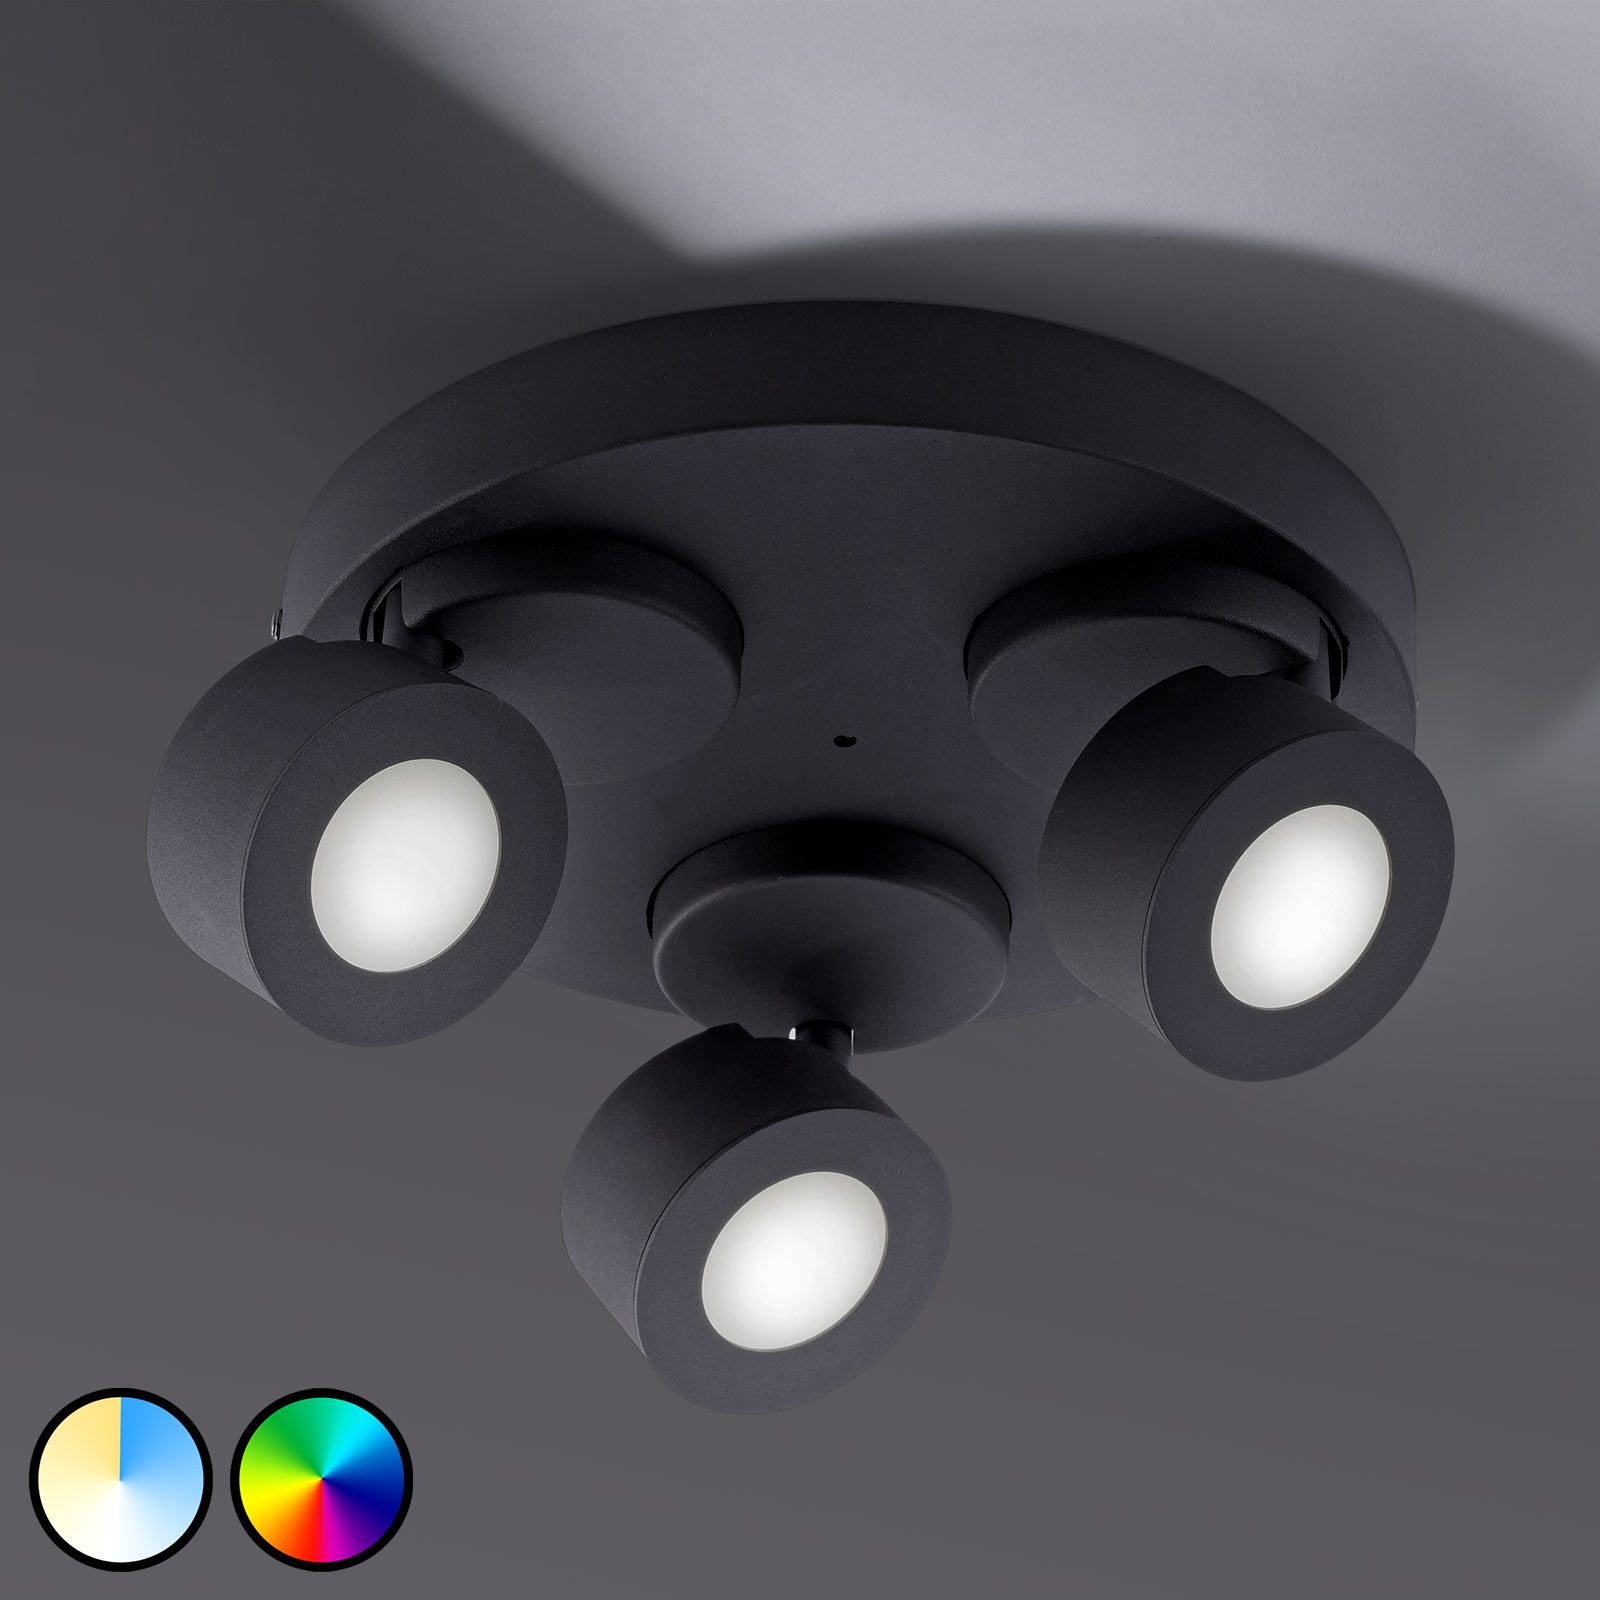 Trio WiZ Sancho LED-Deckenlampe 3-flammig schwarz